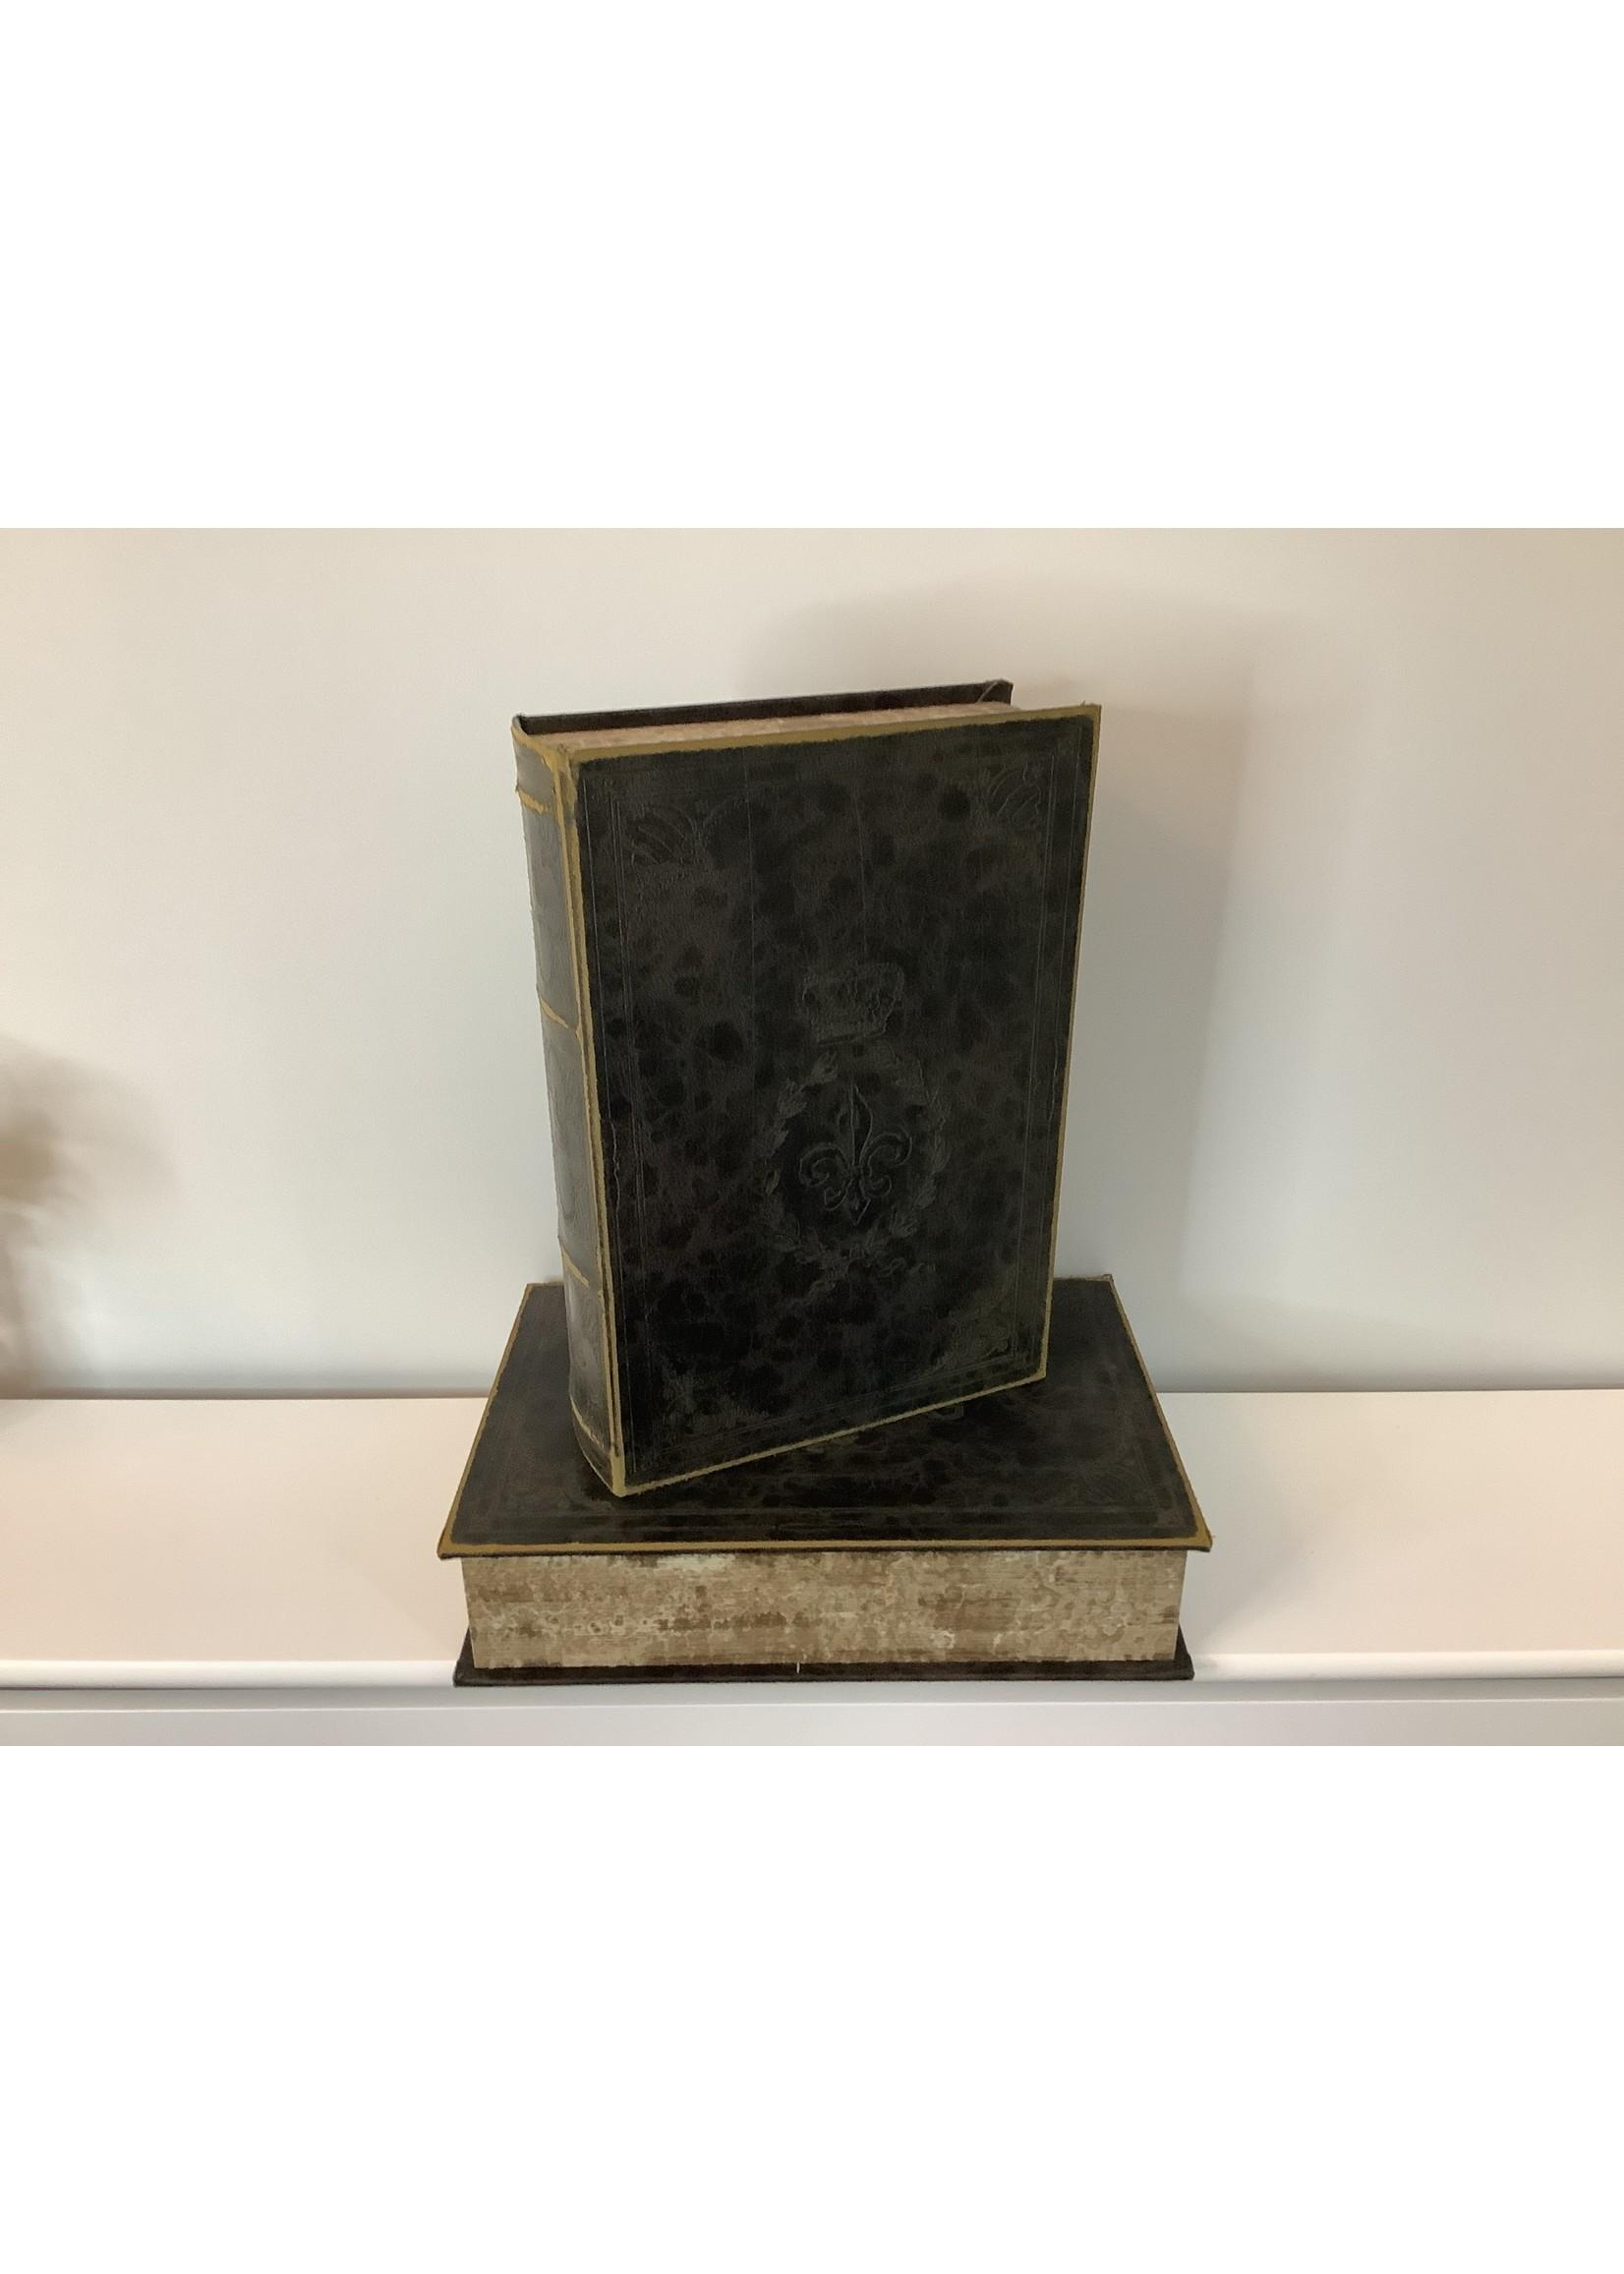 Old Book display box 21x30cm